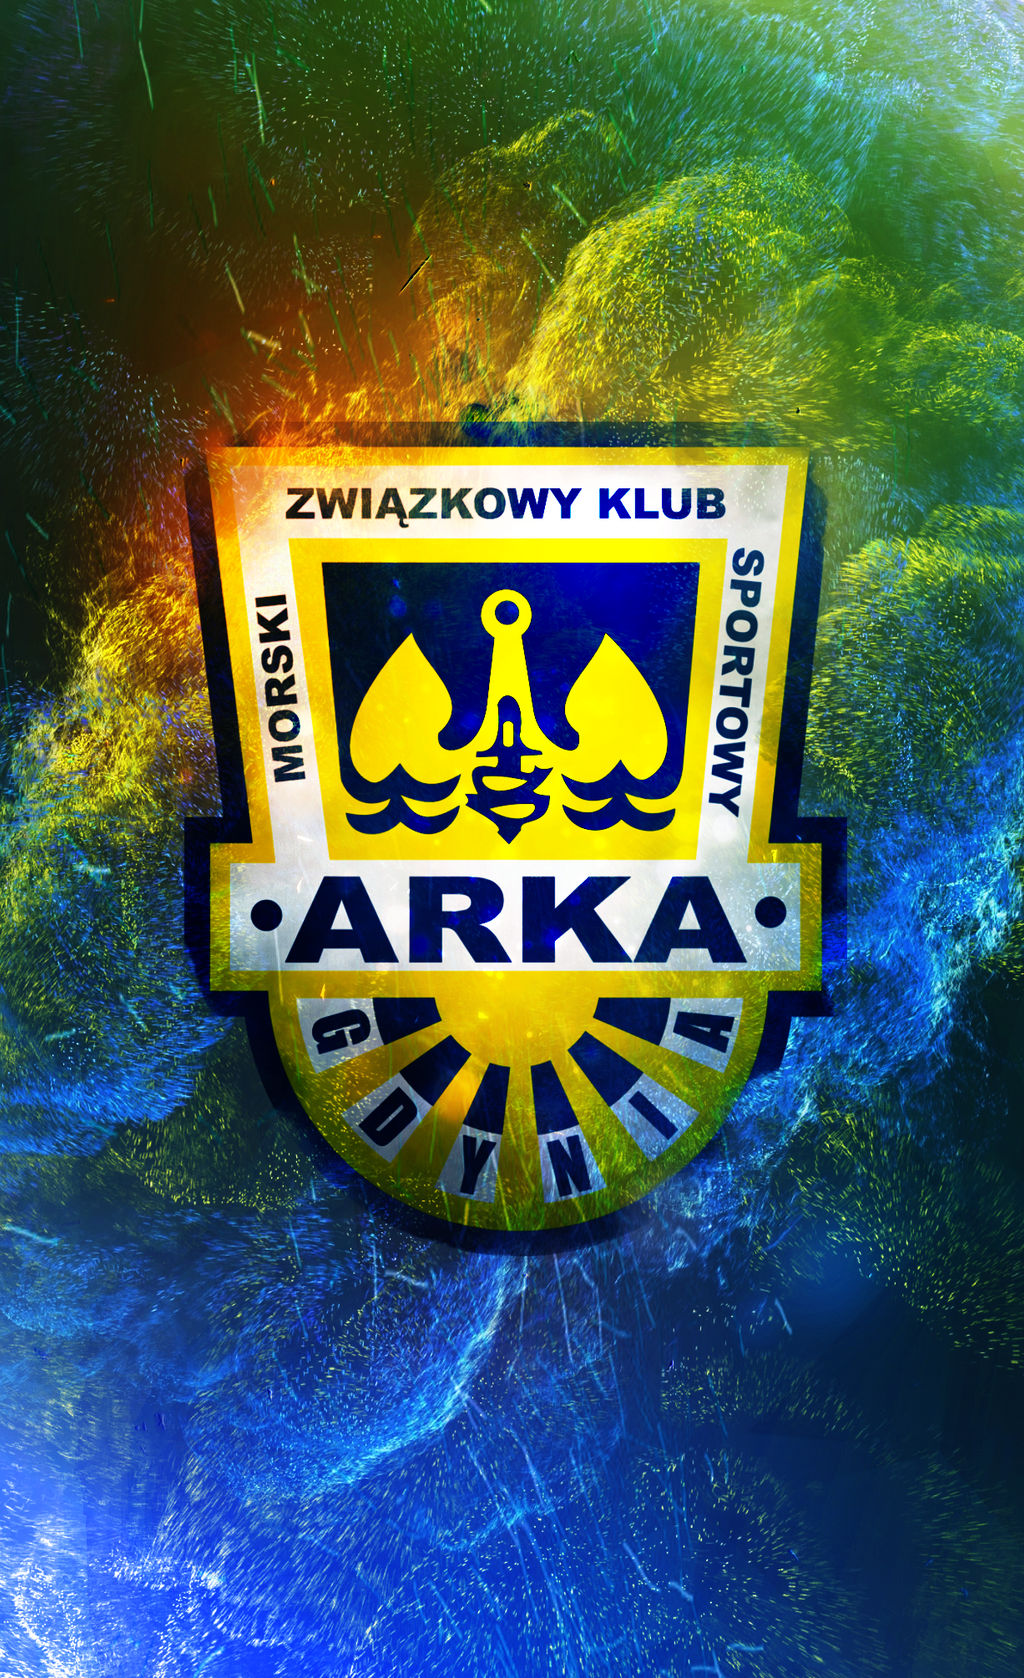 Arka Gdynia logo mobile wallpaper